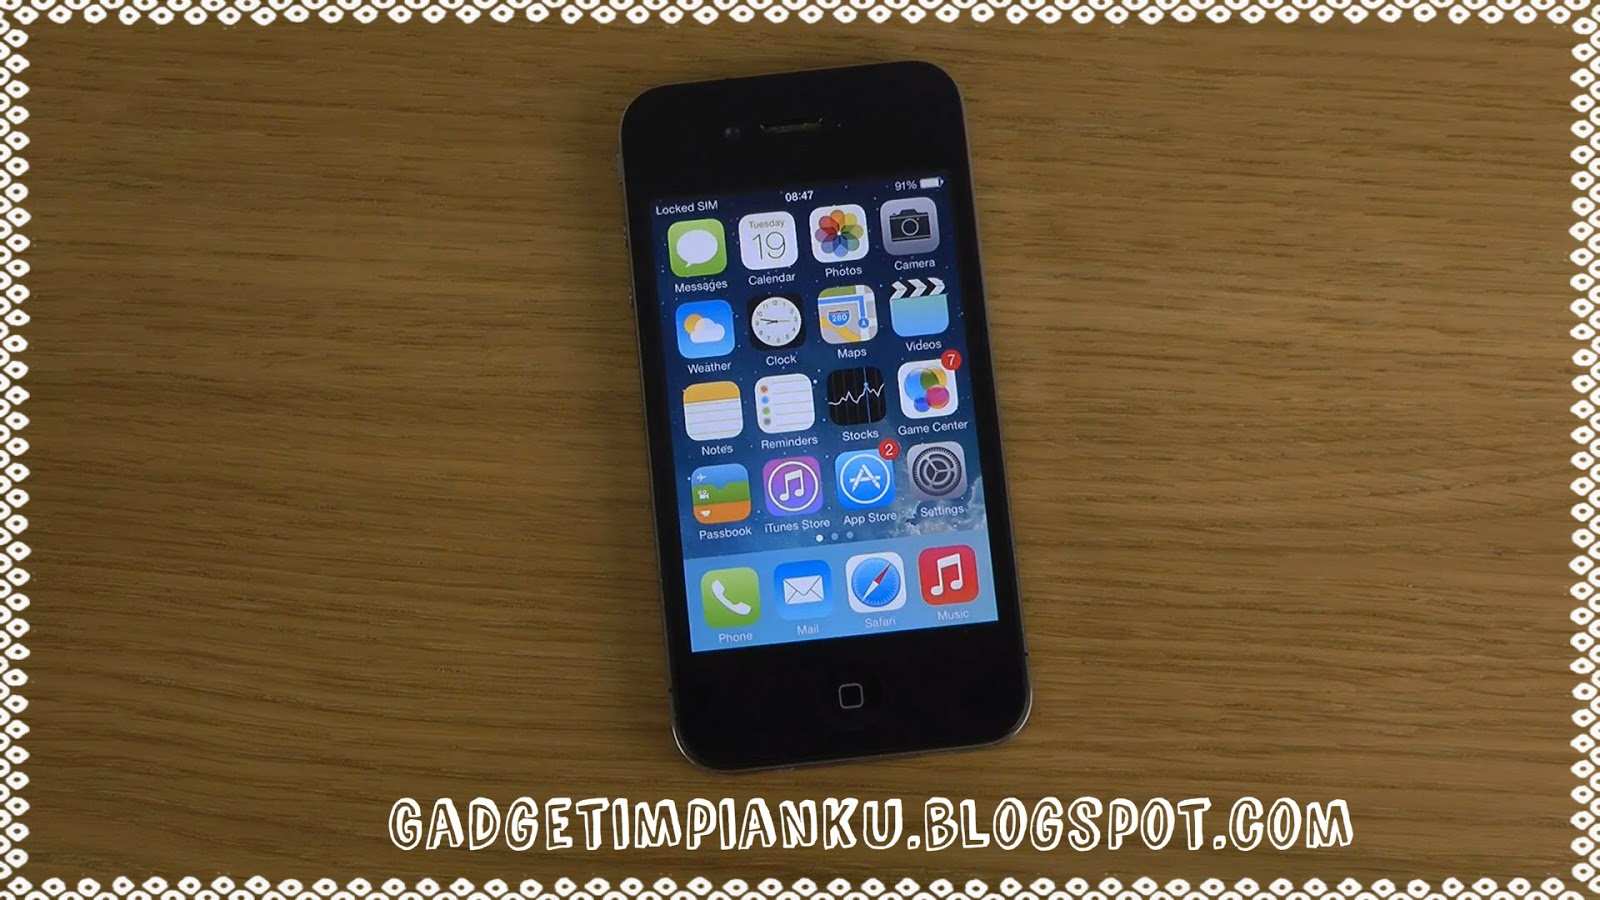 DUEL Harga IPhone 4 Dan IPhone 5 Mana Yang Terbaik